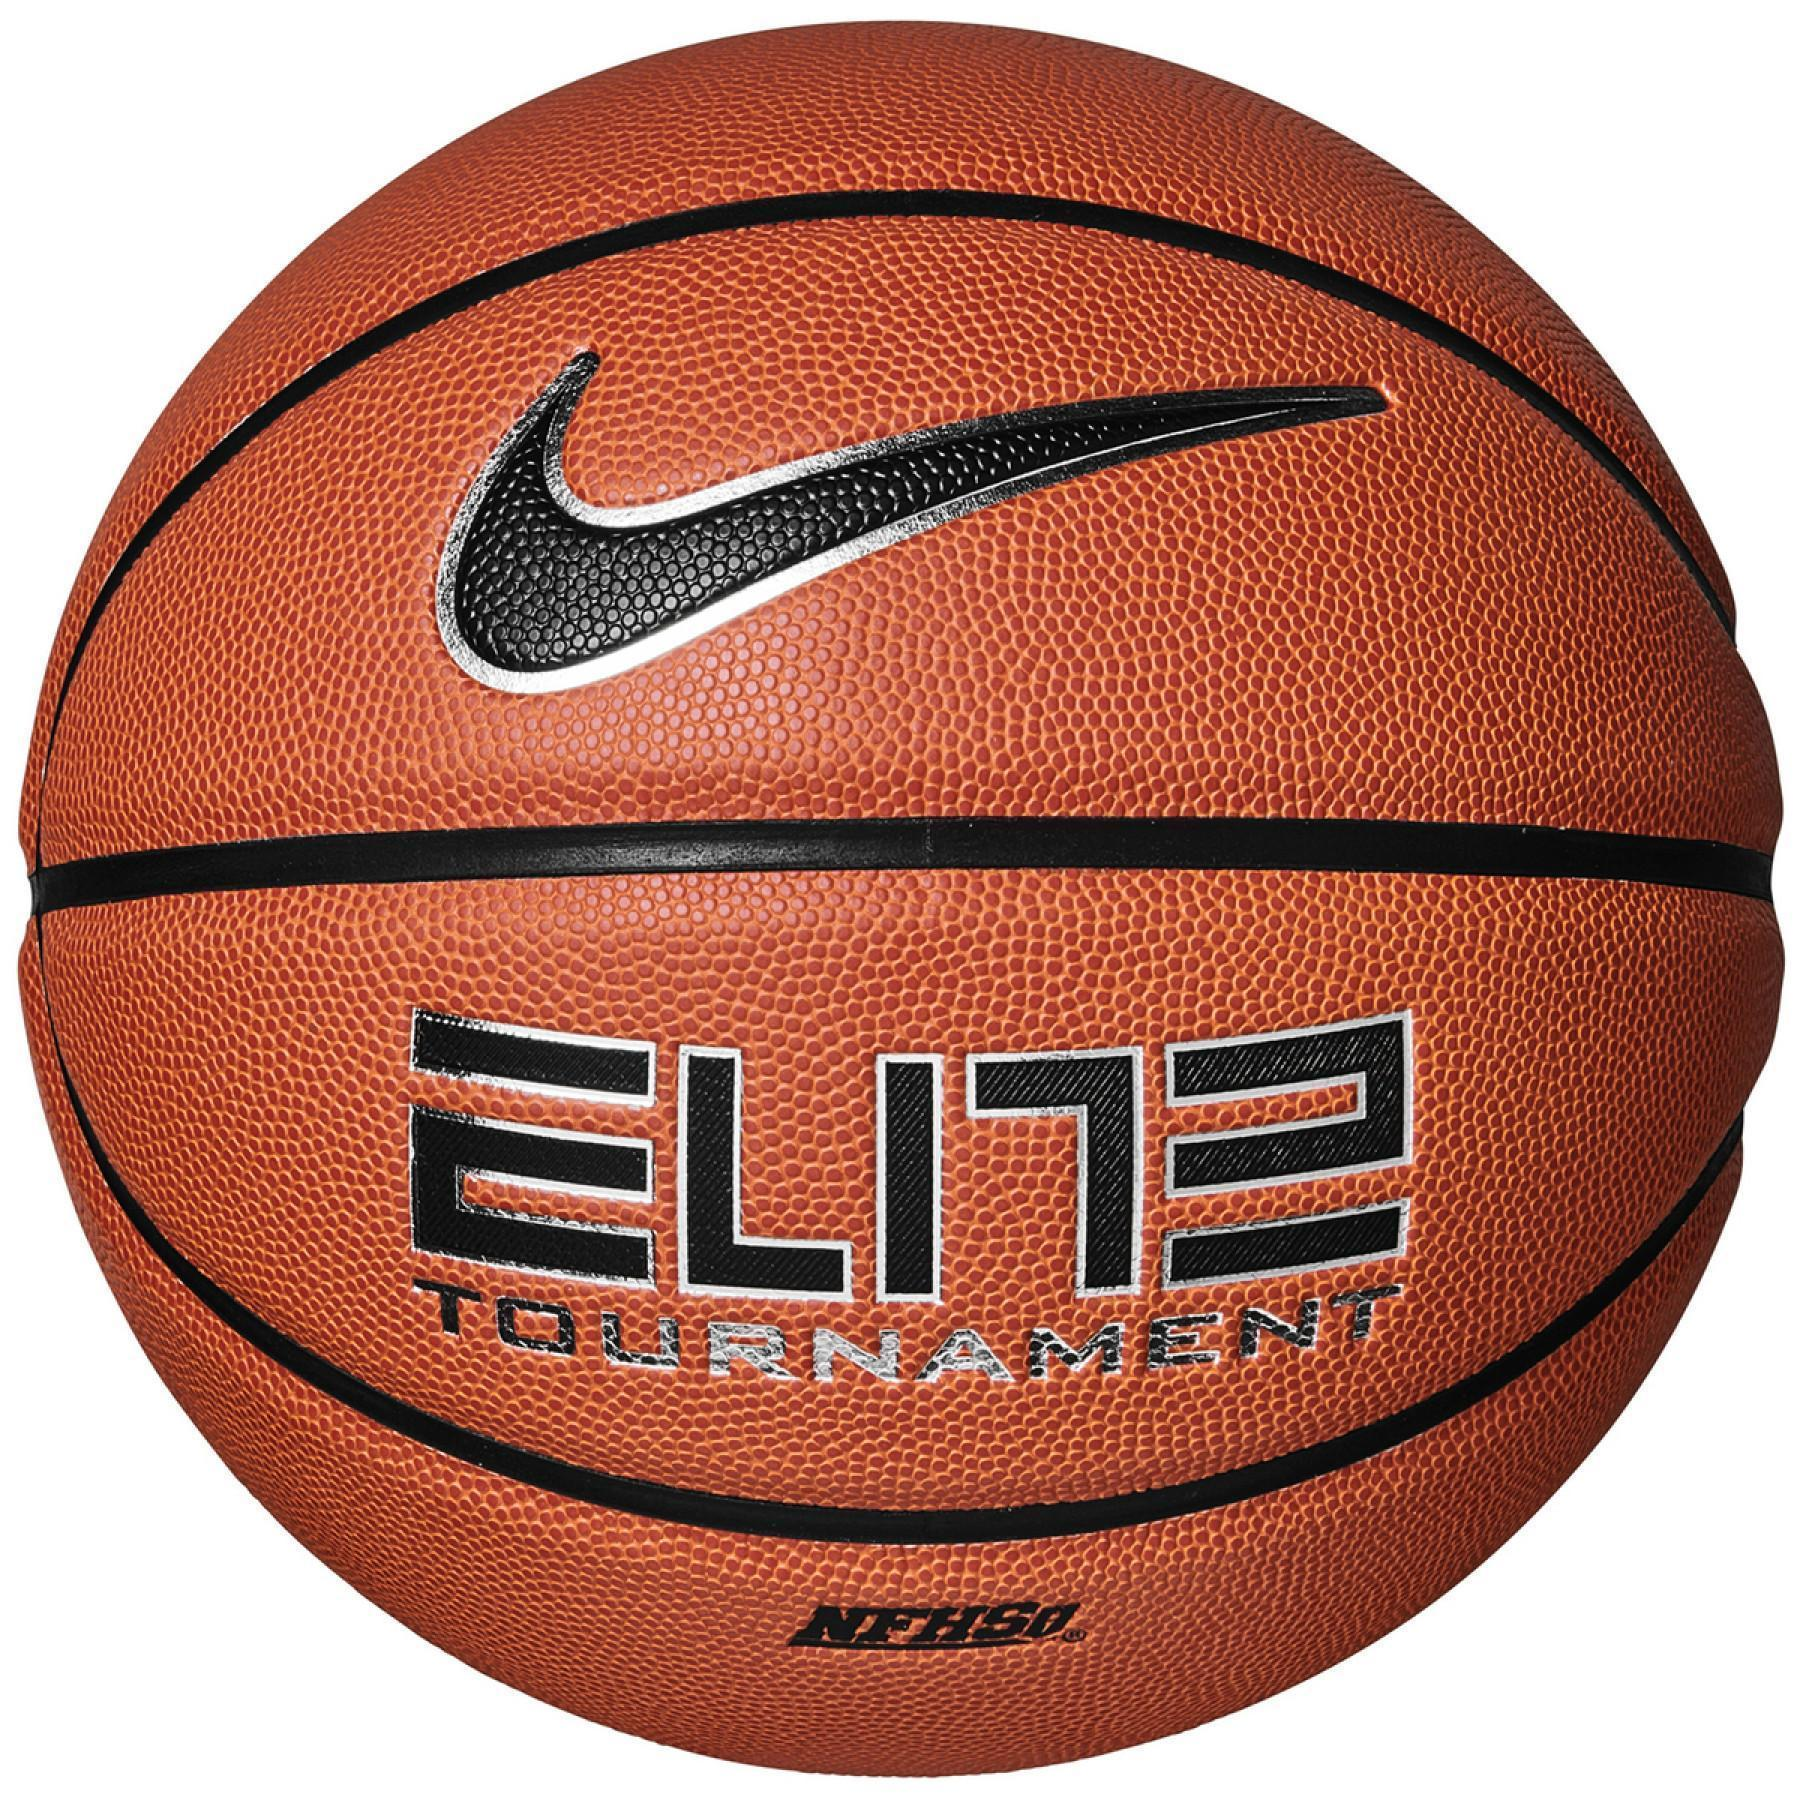 Nike elite tournament ball